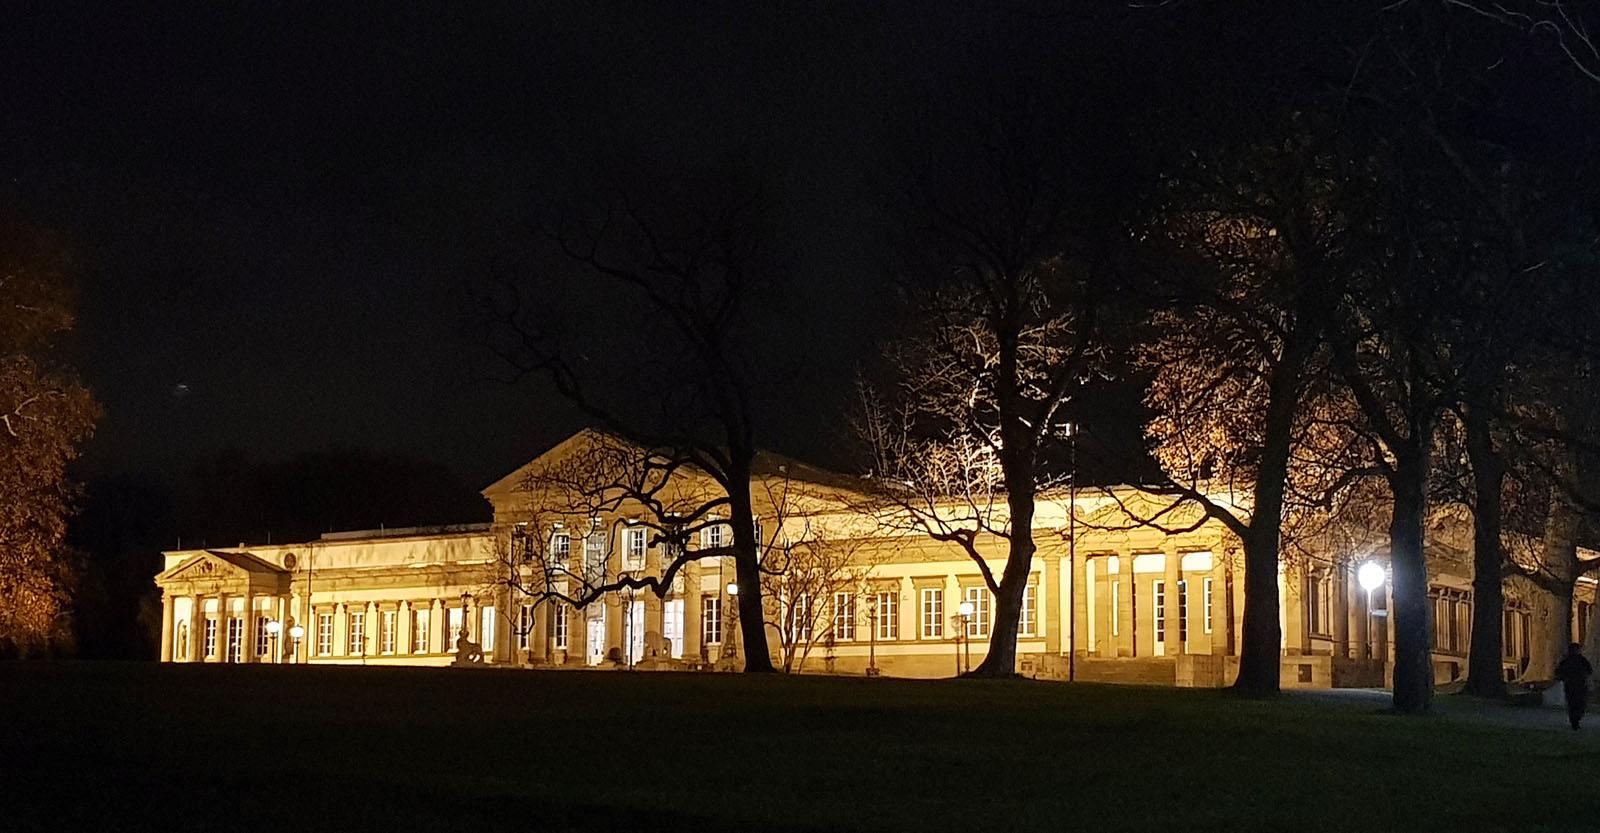 Lange Nacht der Museen Stuttgart - Museum Schloss Rosenstein Nacht